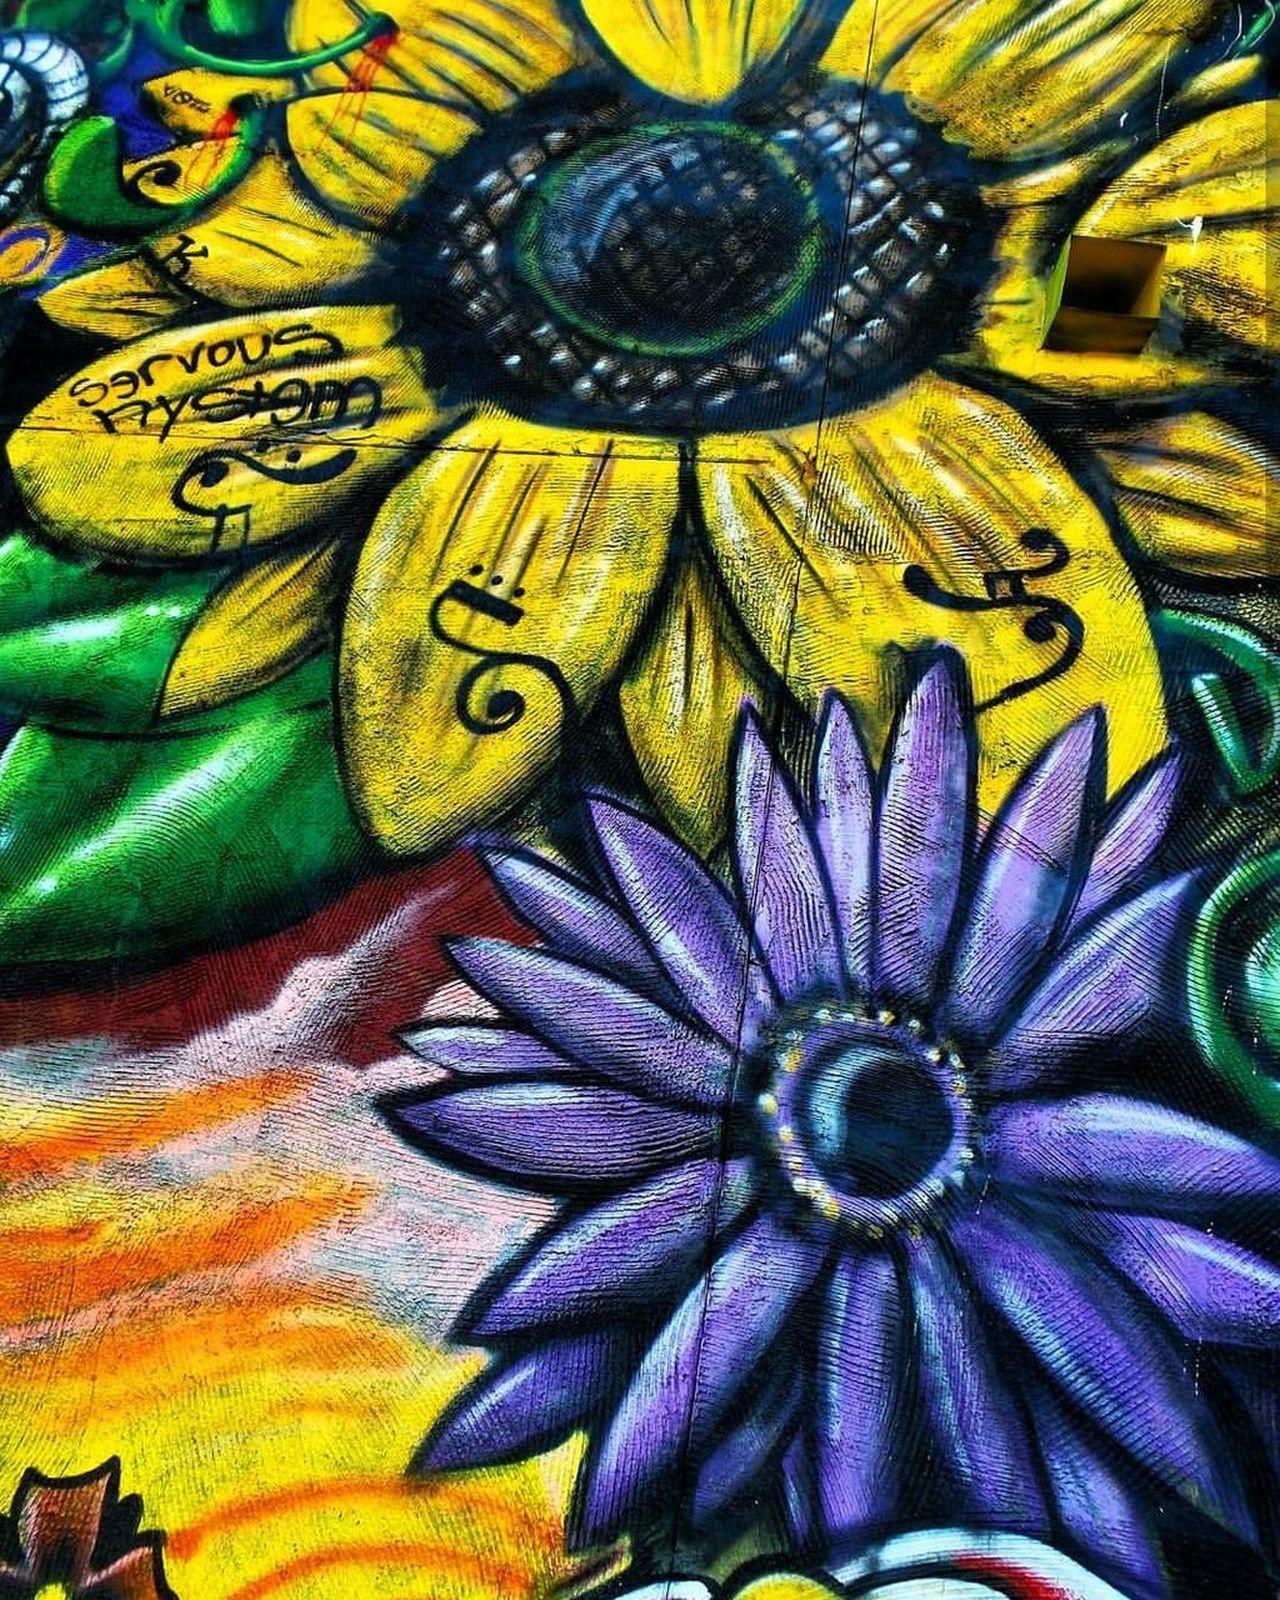 Multi Colored Creativity Close-up ArtWork Graffiti Streetart/graffiti Streetphotography Building Exterior Texture Pattern Mural Flower Premium Collection EyeEm Vision EyeEm Best Shots BestEyeemShots BestofEyeEm EyeEmBestEdits